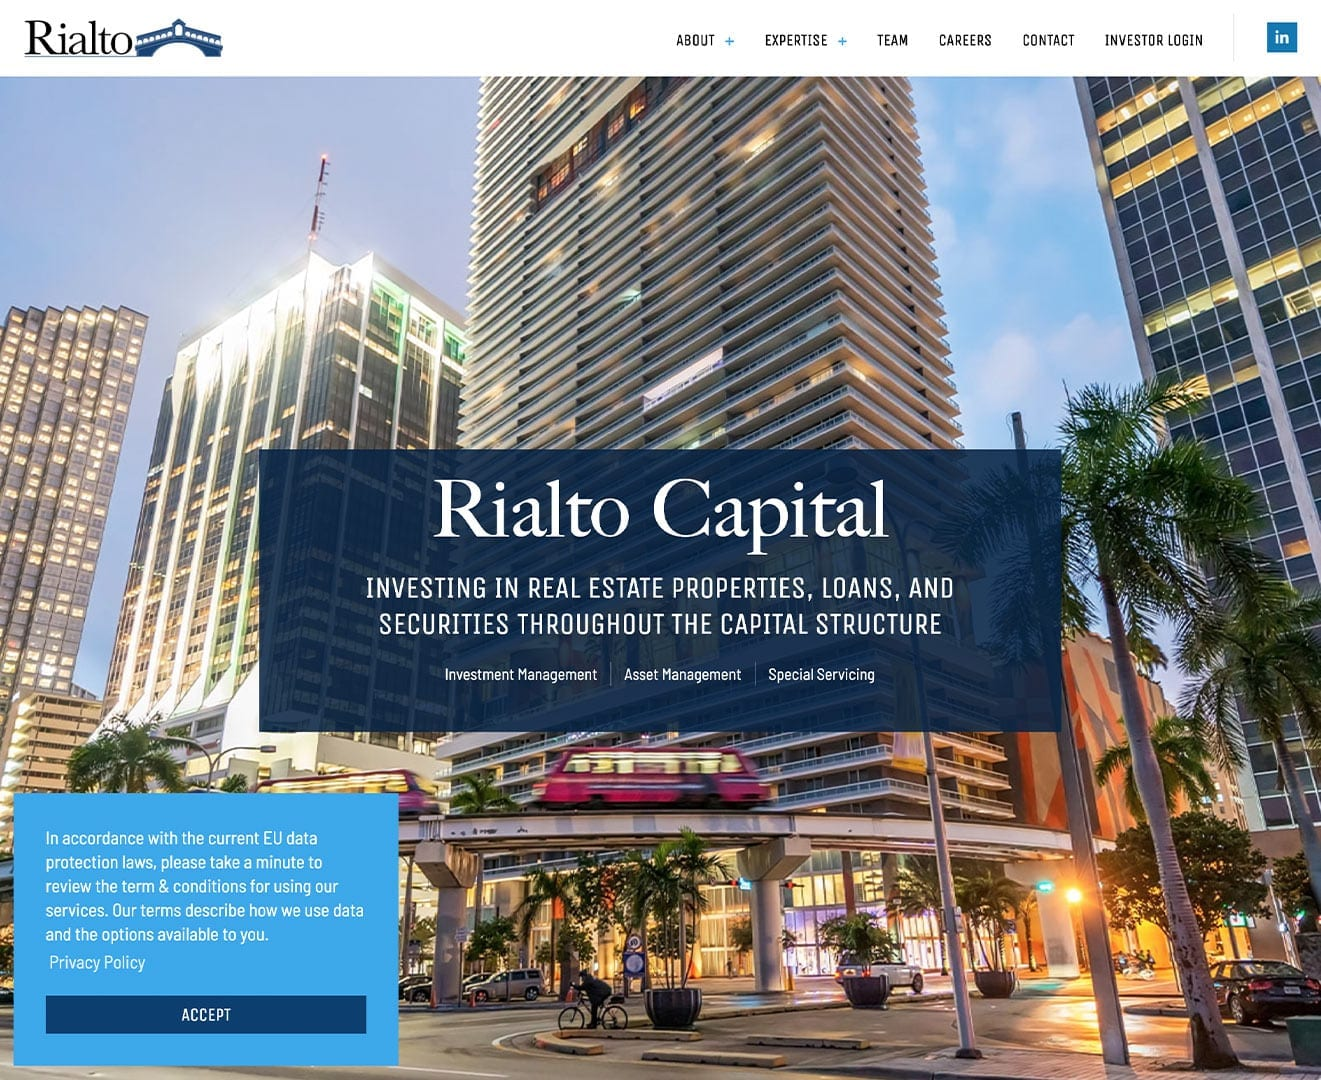 Rialto Capital – New Website Design by sliStudios